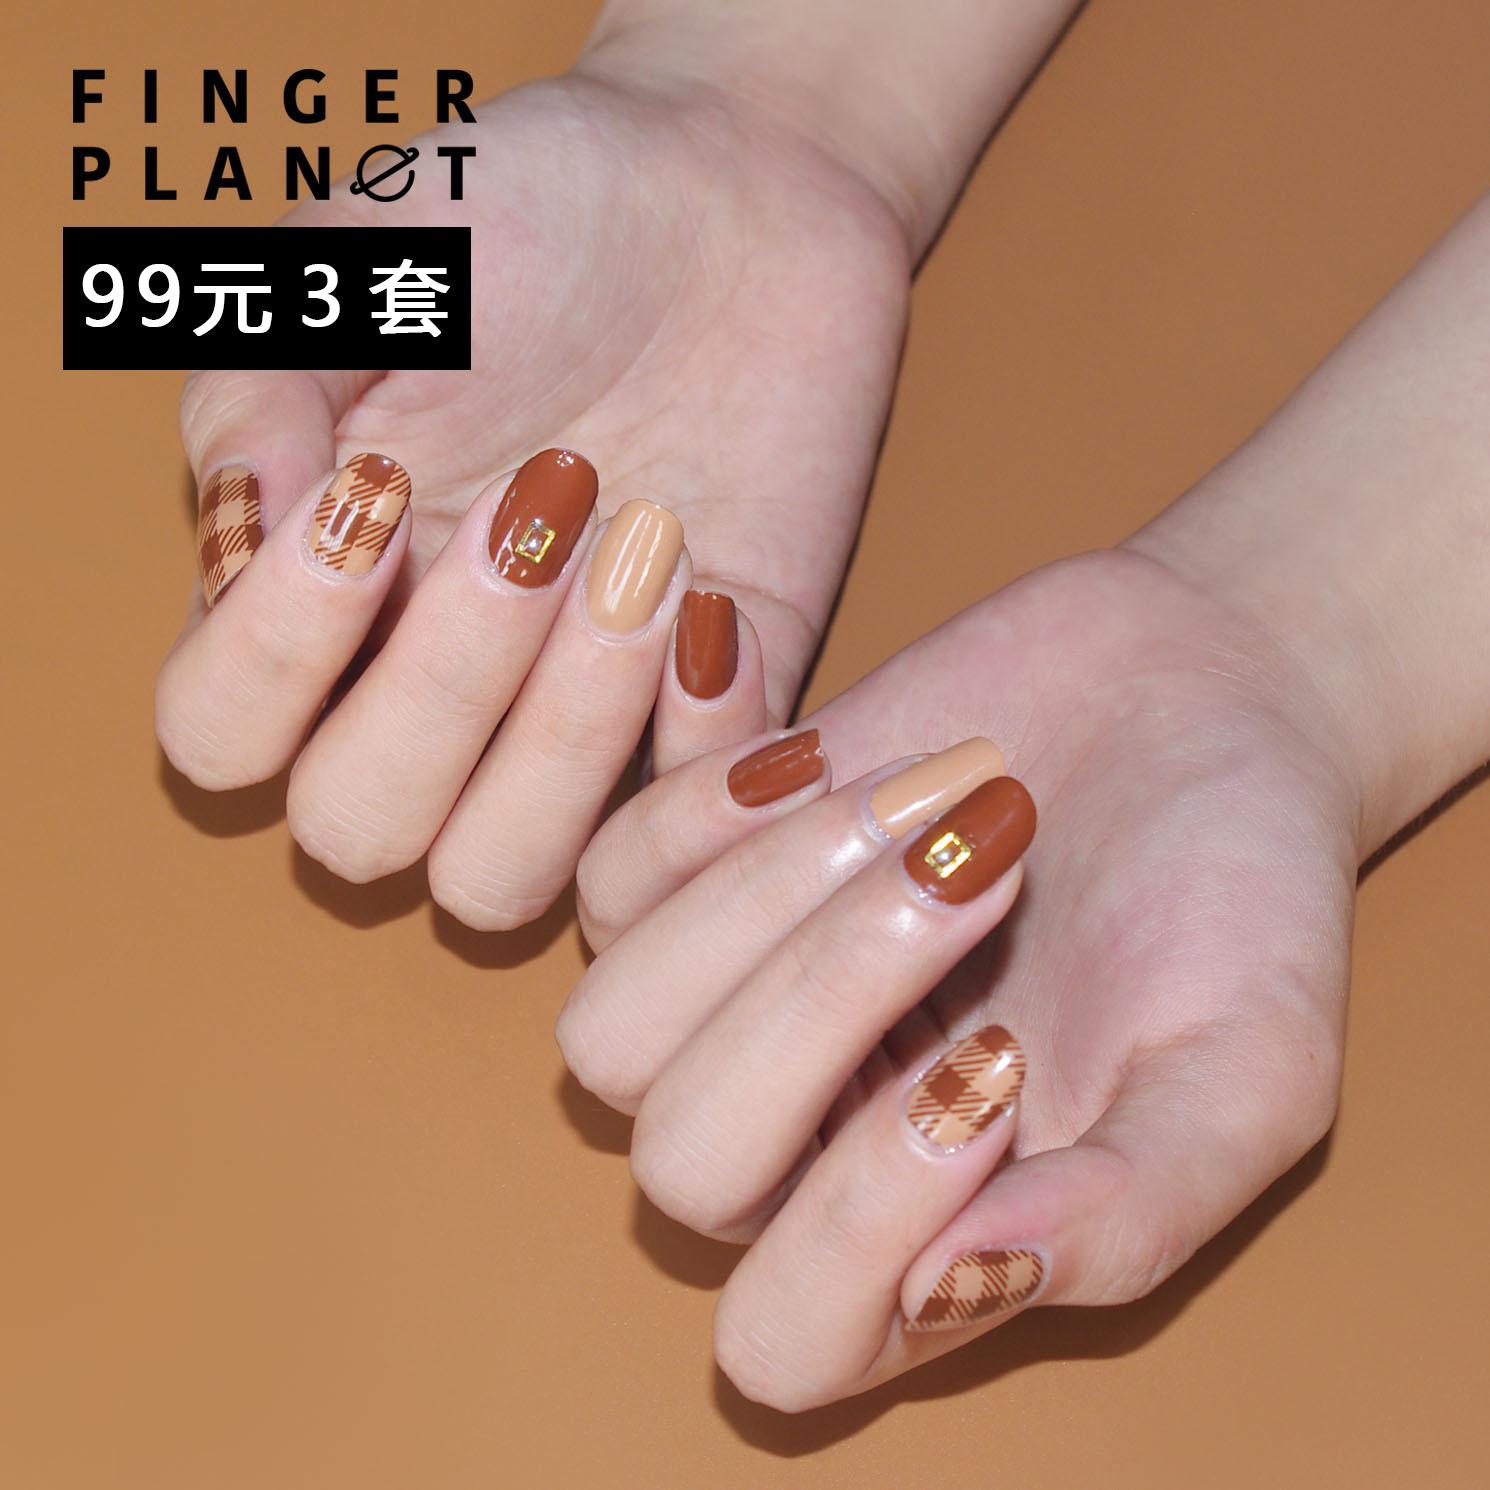 Refers to planet finderplanet nail polish film / nail sticker / nail polish sticker / nail sticker milk coffee lattice